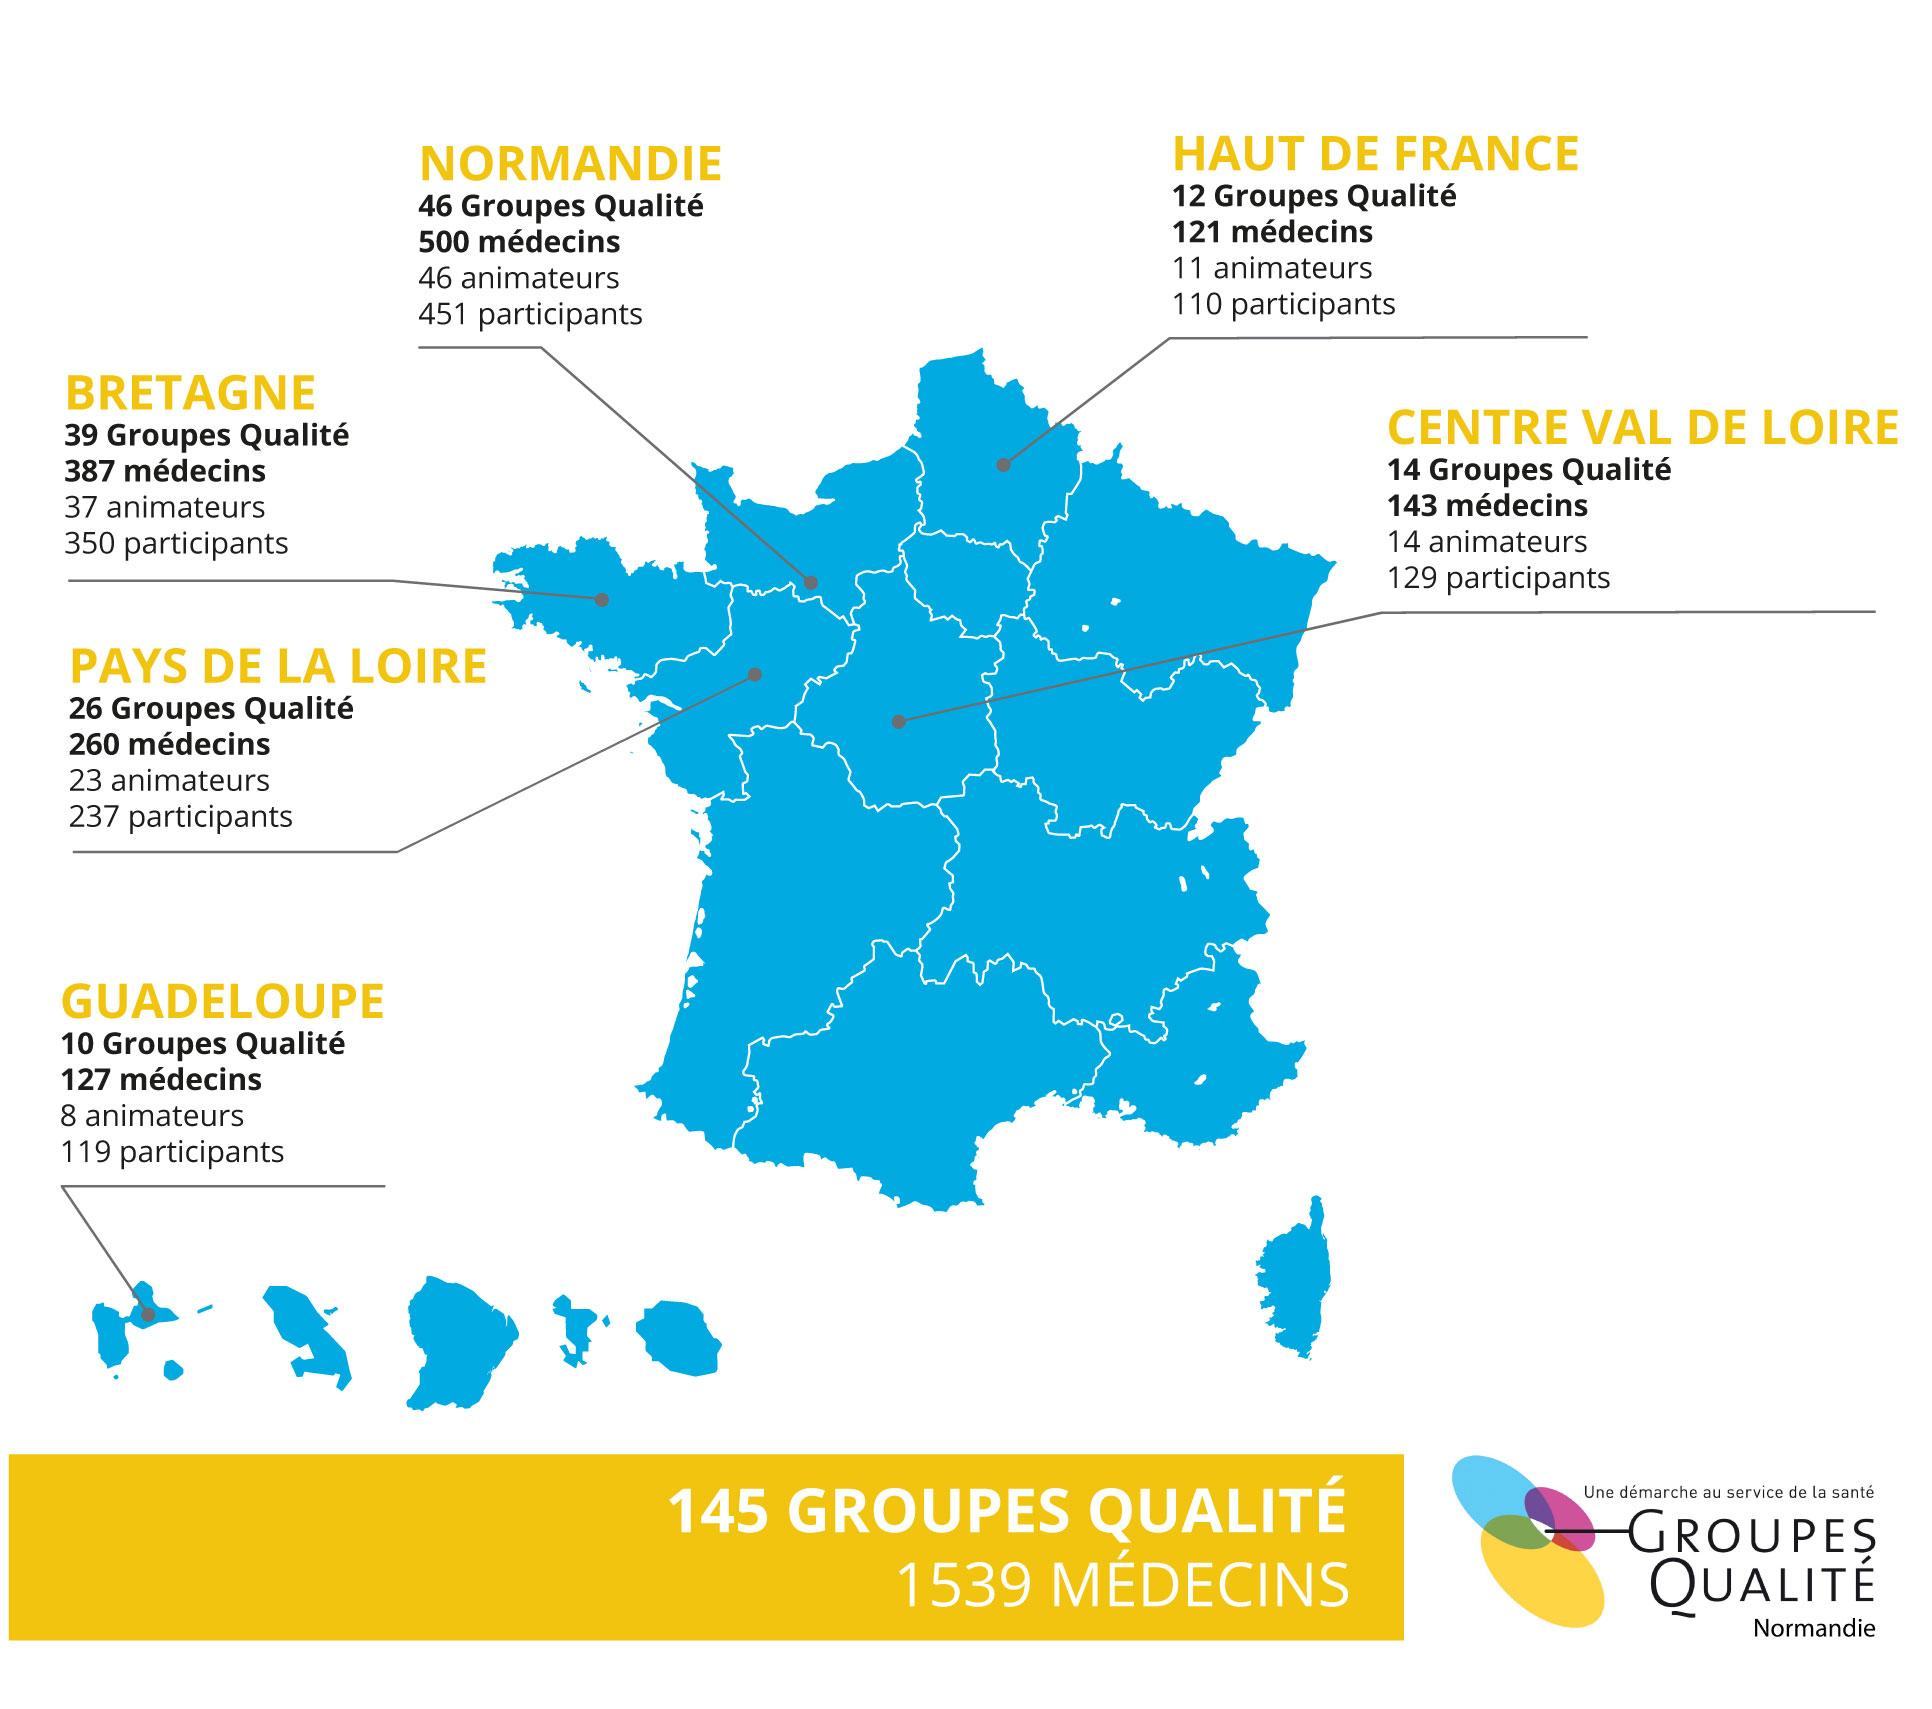 ID 17065 maquette groupe qualiteeeeeee - Les Groupes Qualité normandie en image